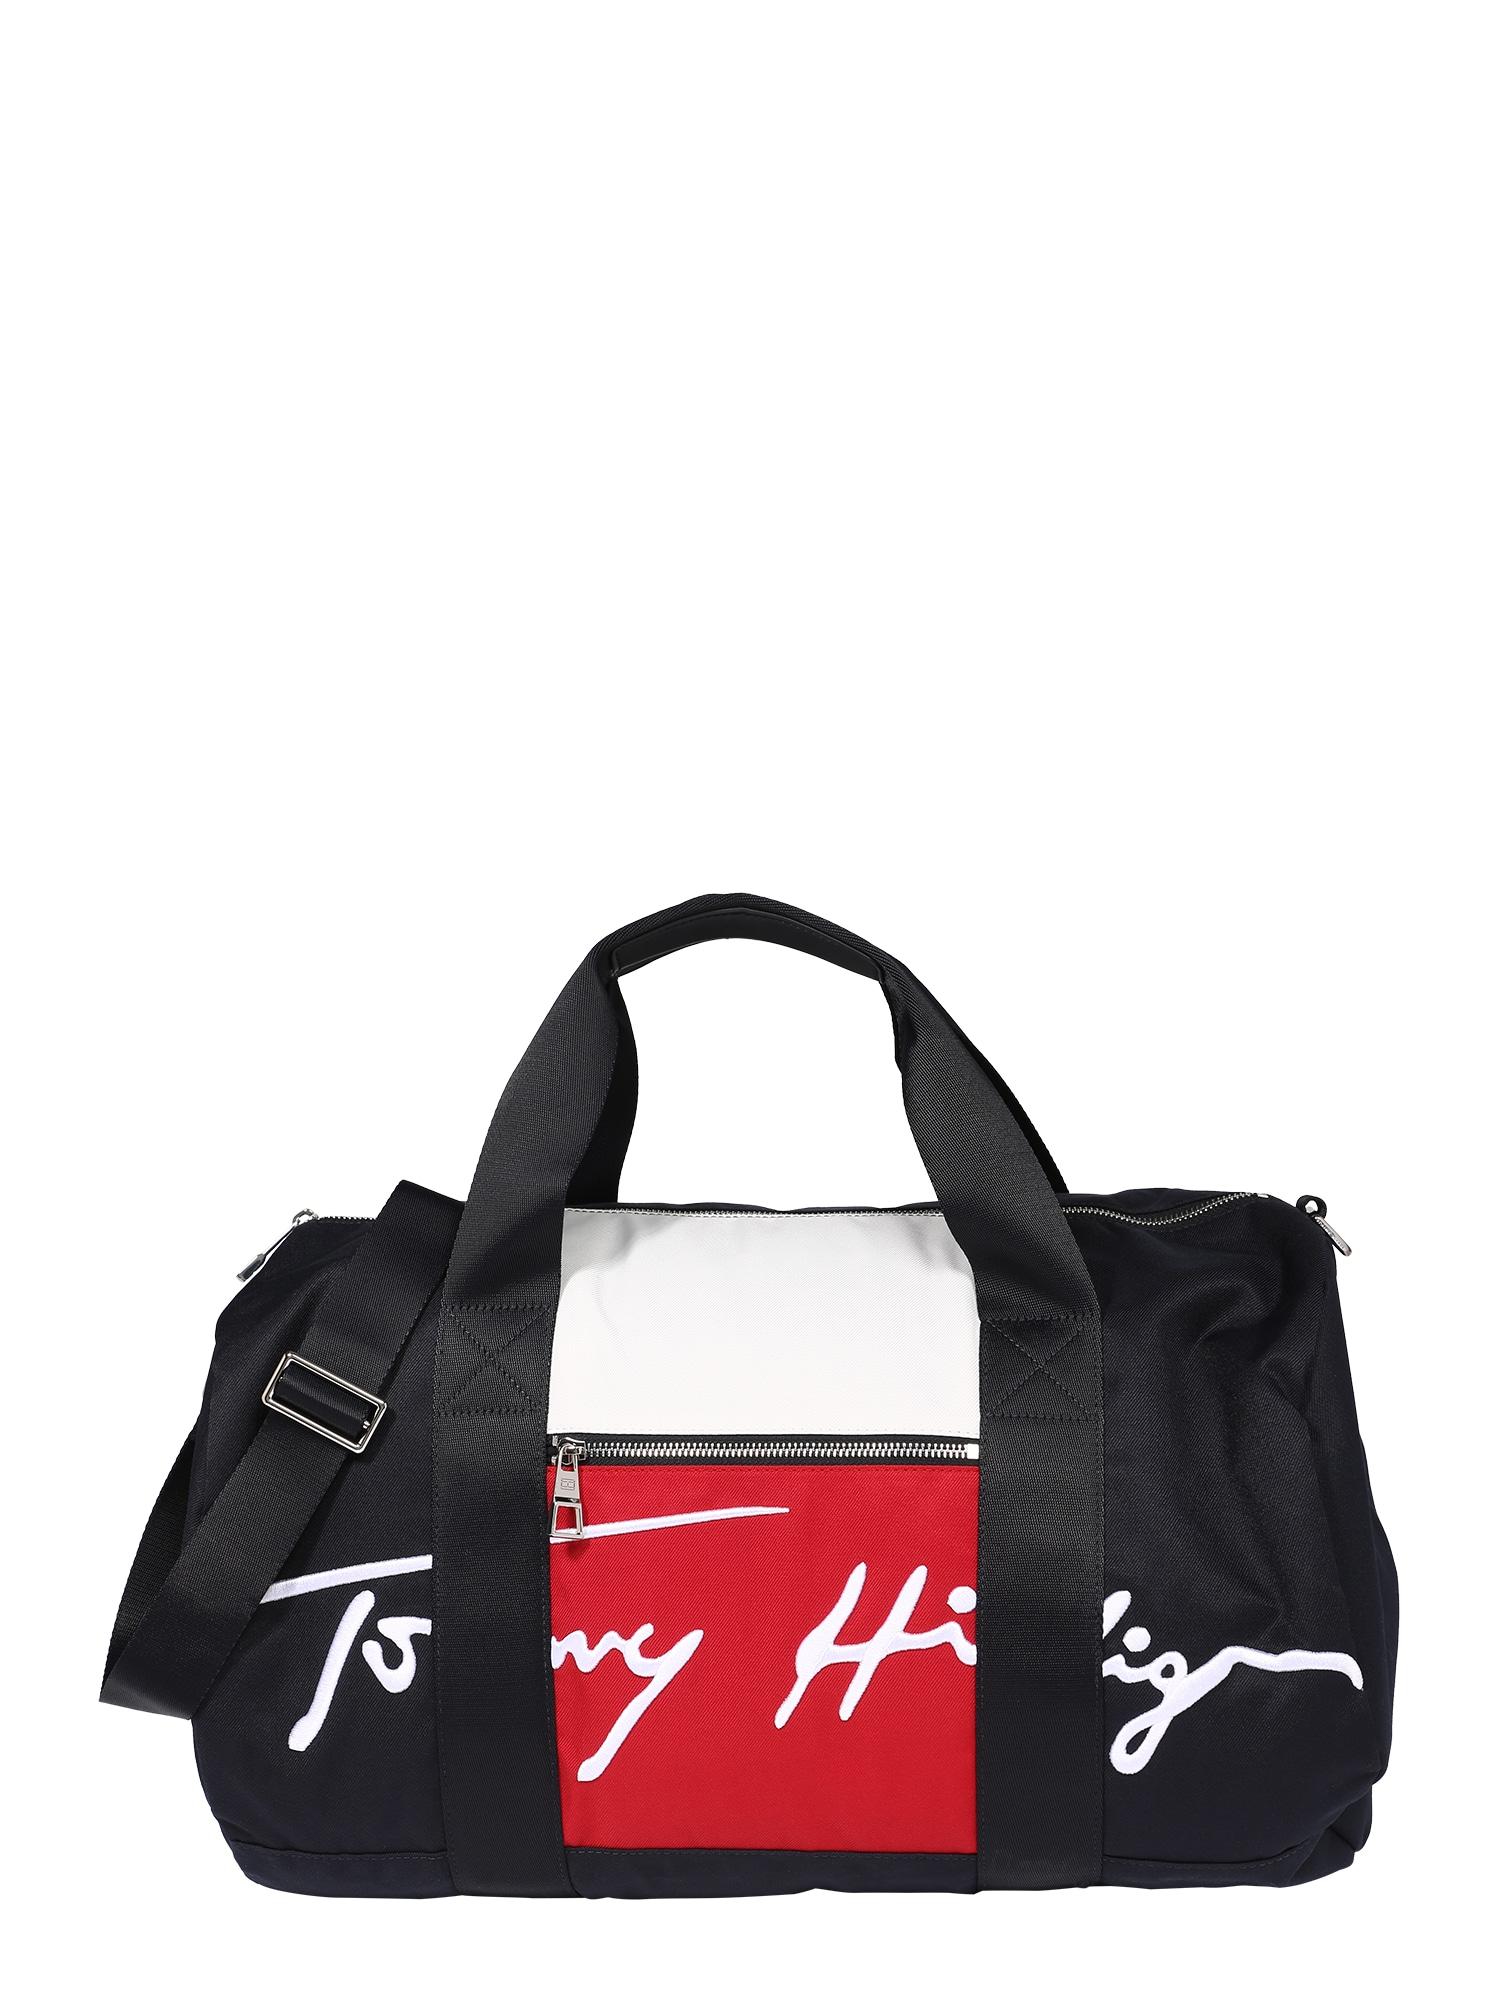 TOMMY HILFIGER Kelioninis krepšys tamsiai mėlyna / balta / raudona